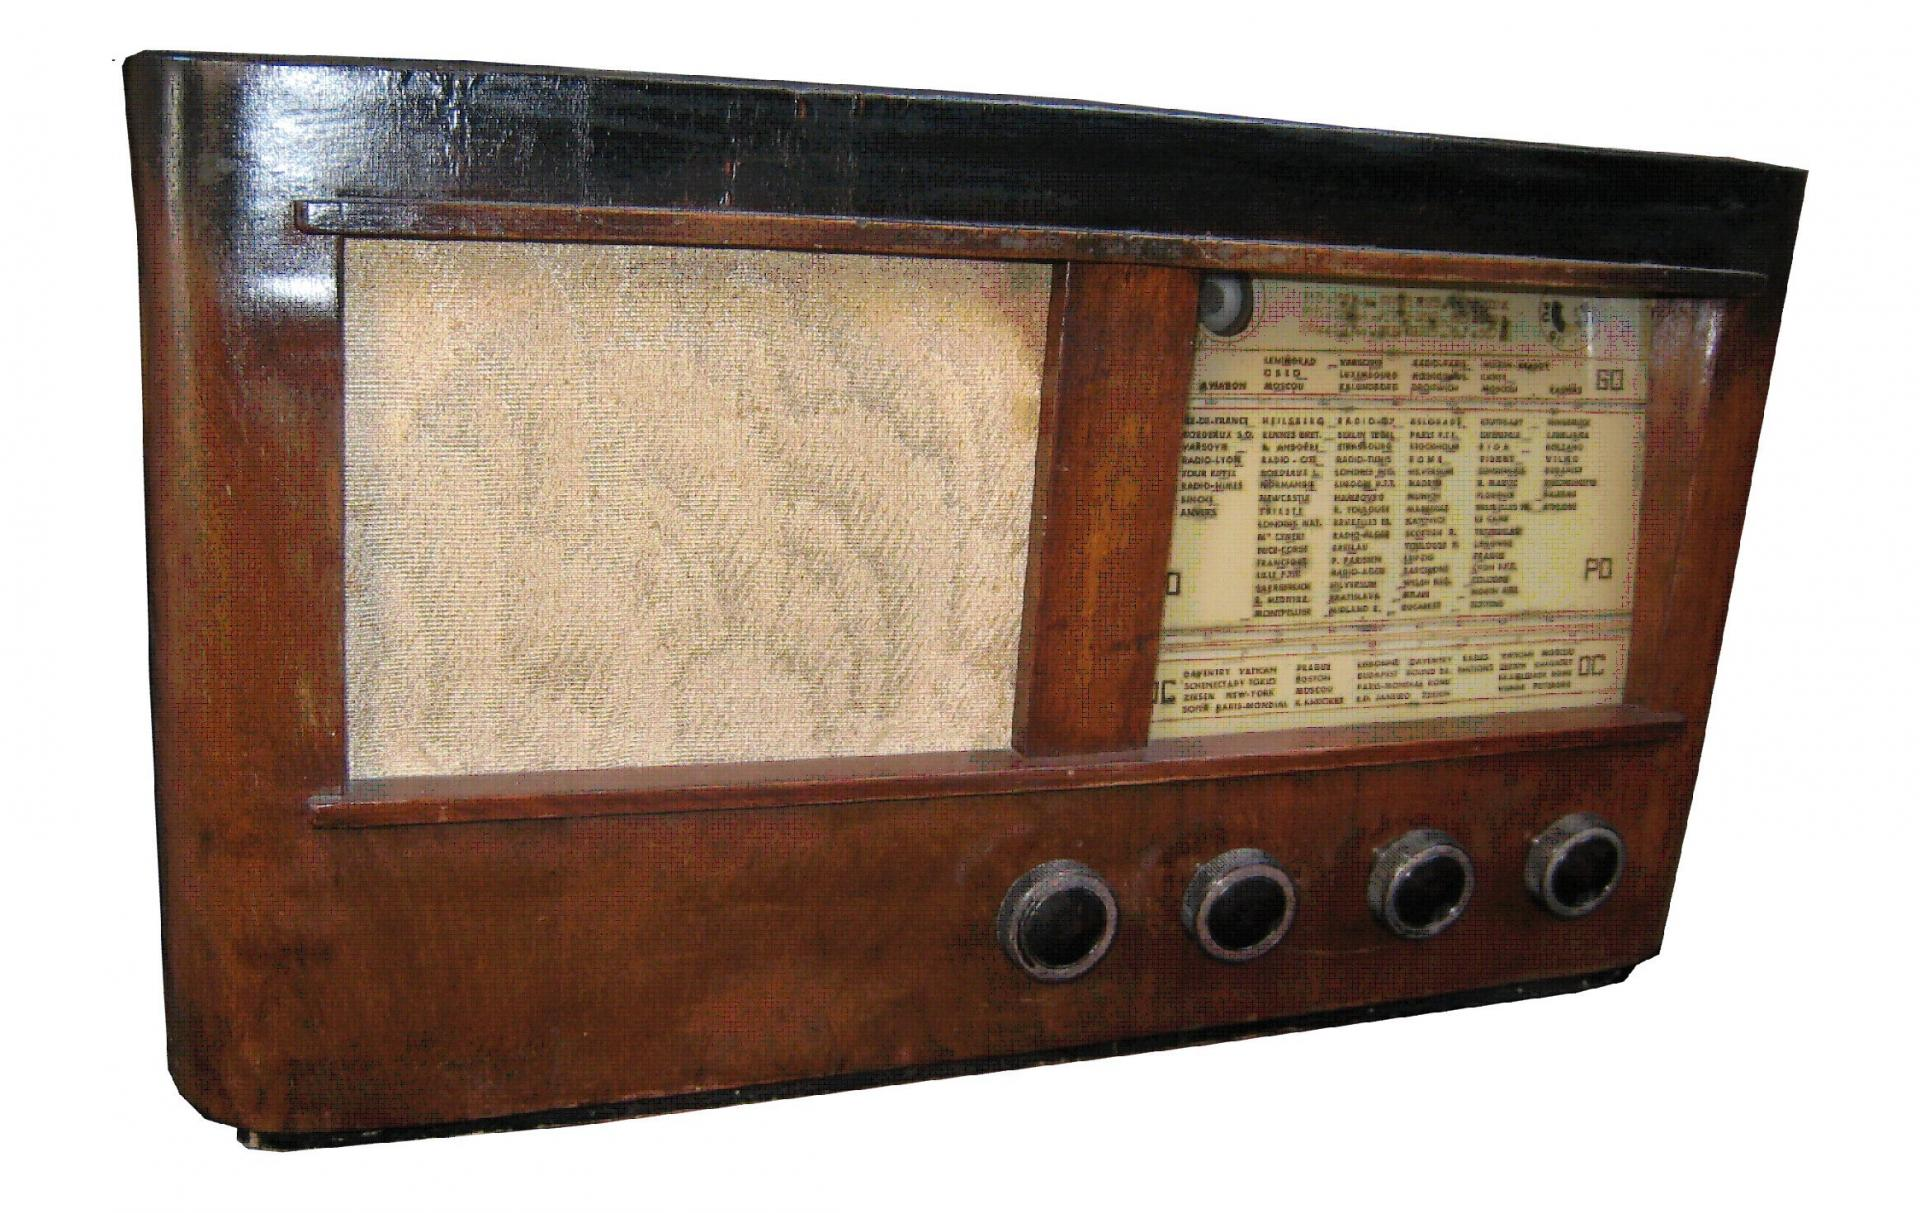 Radio LL